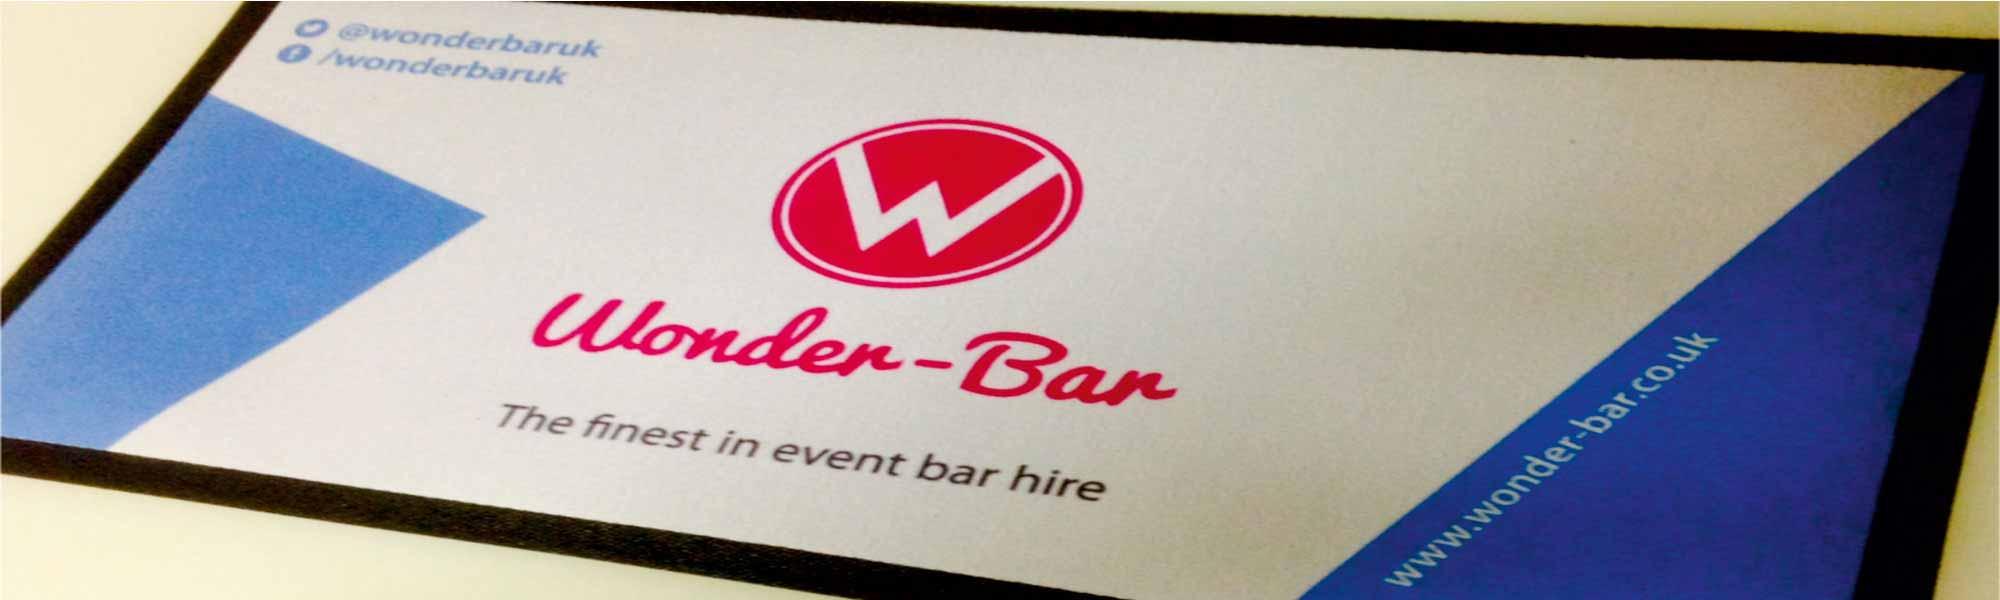 Wonder-Bar bar runner